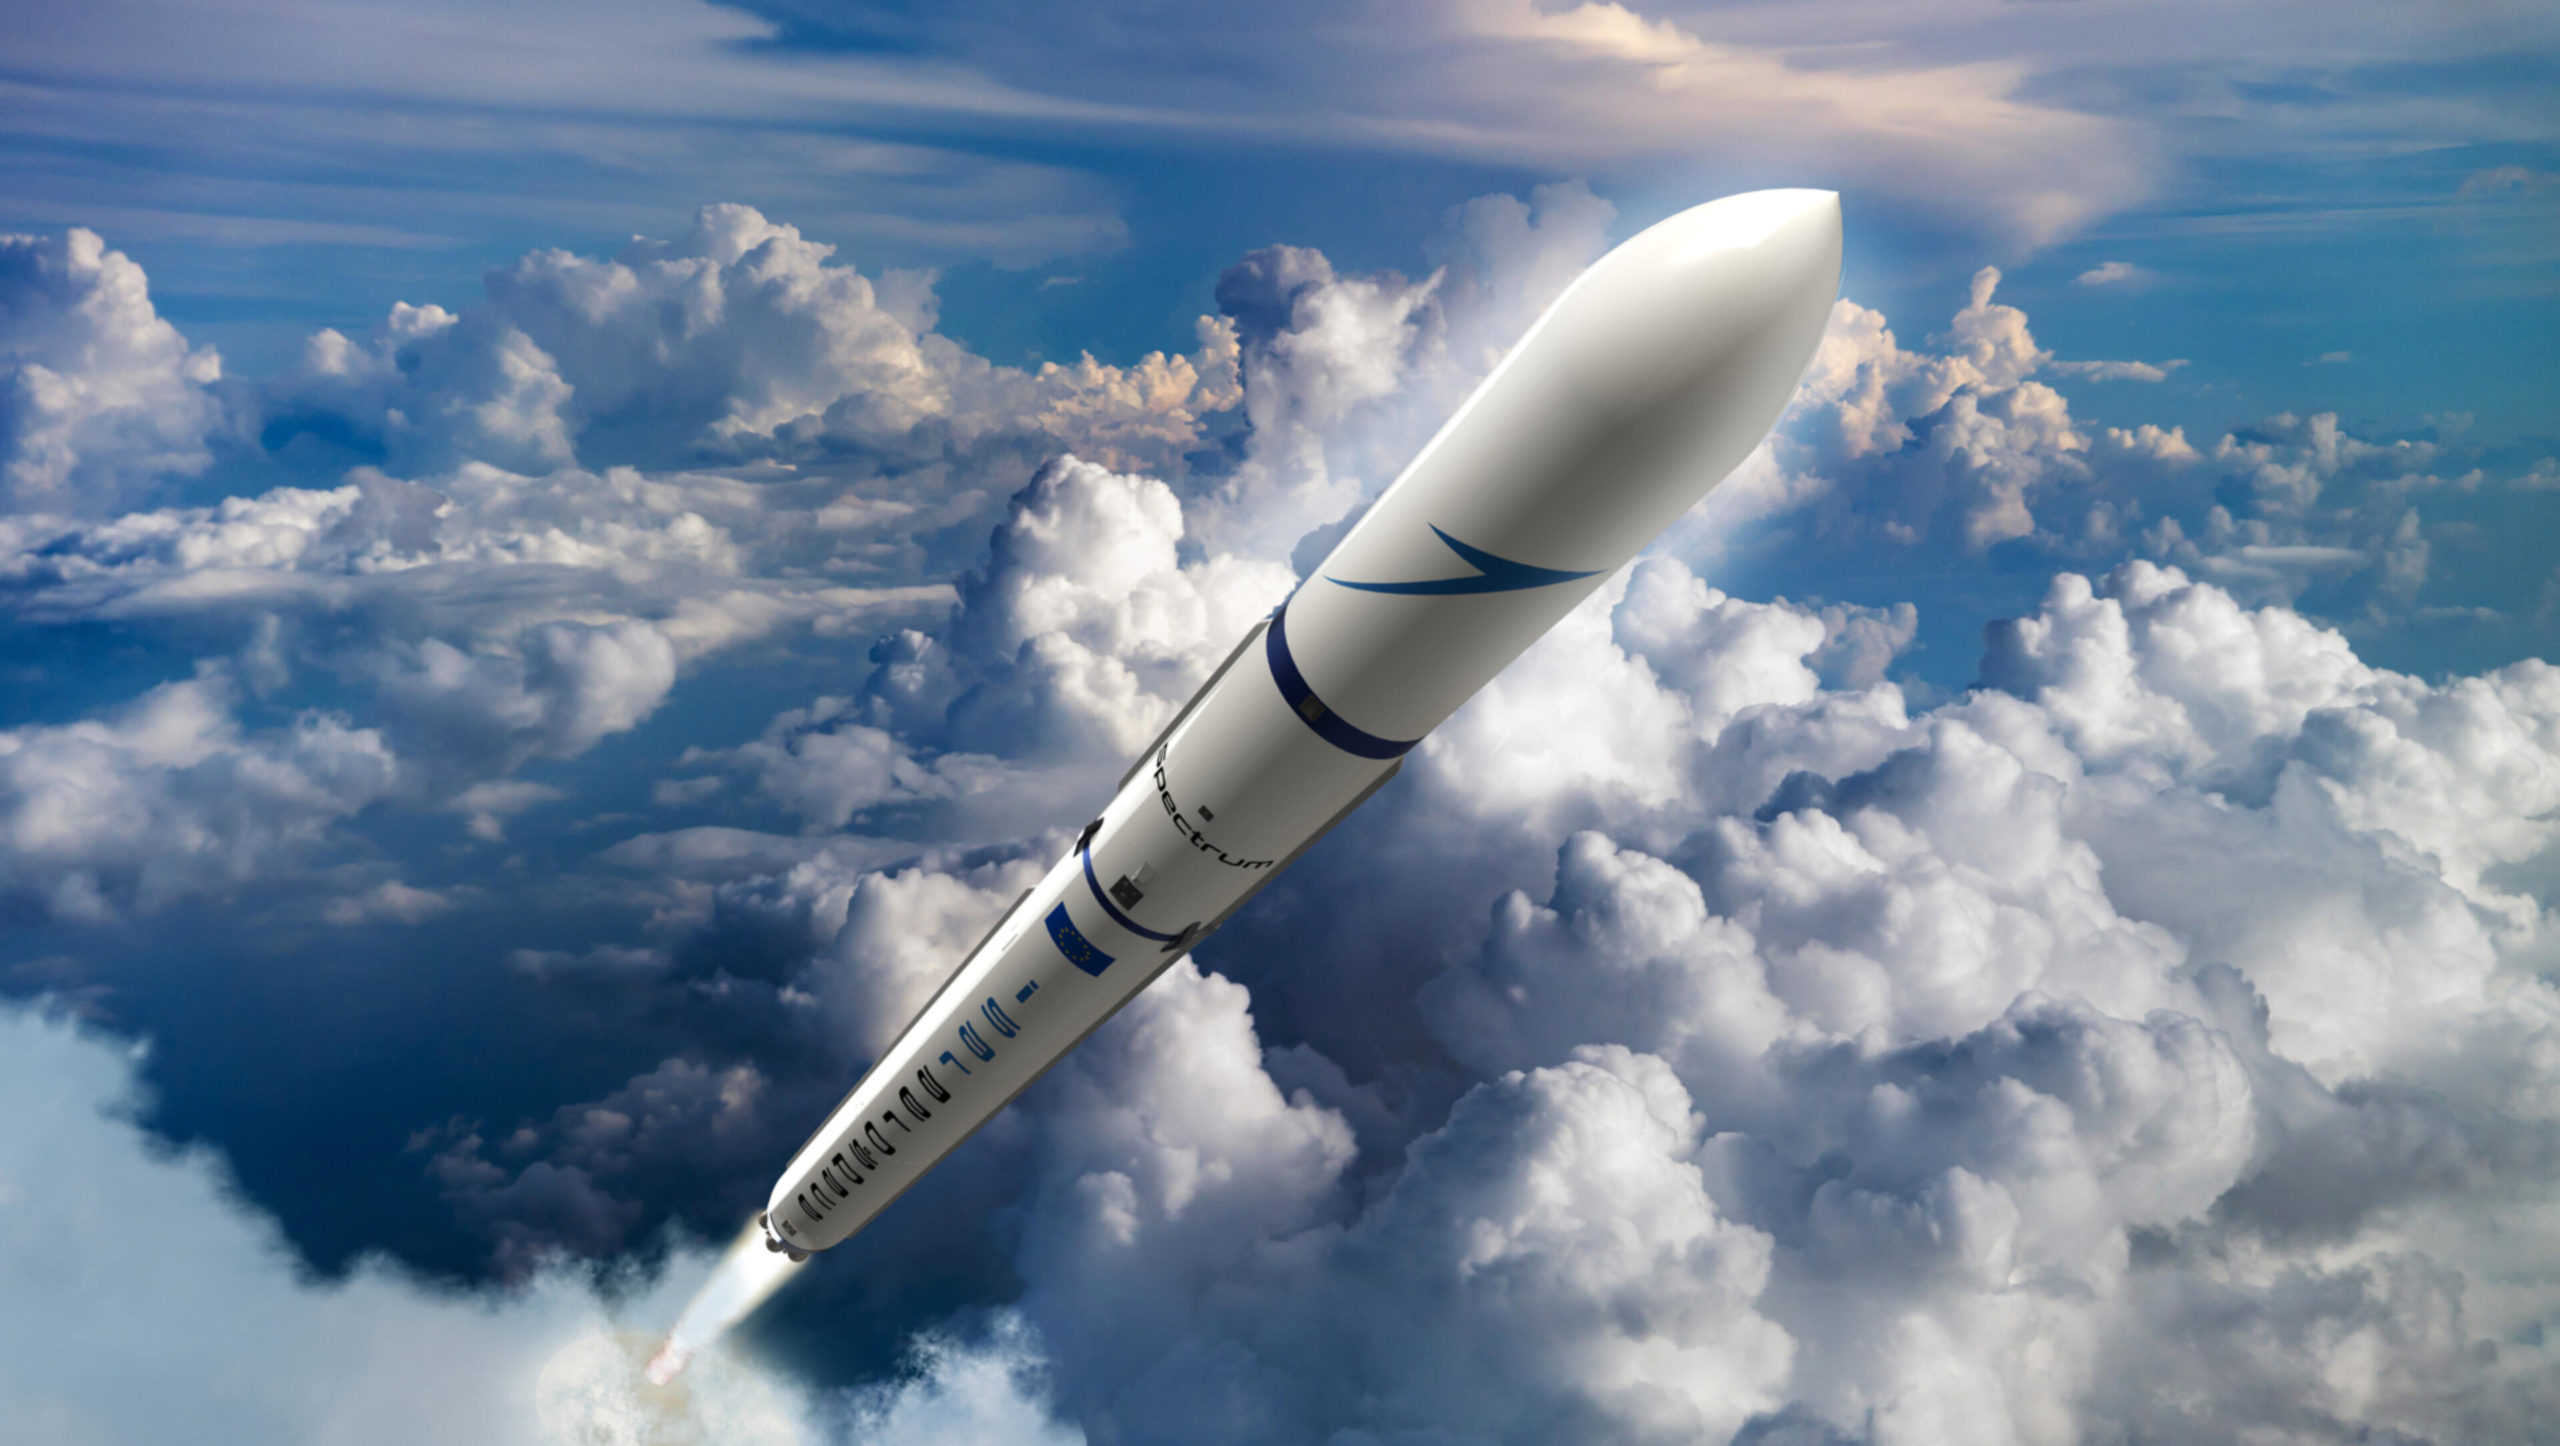 Spectrum-Rakete von Isar Aerospace. © Isar Aerospace